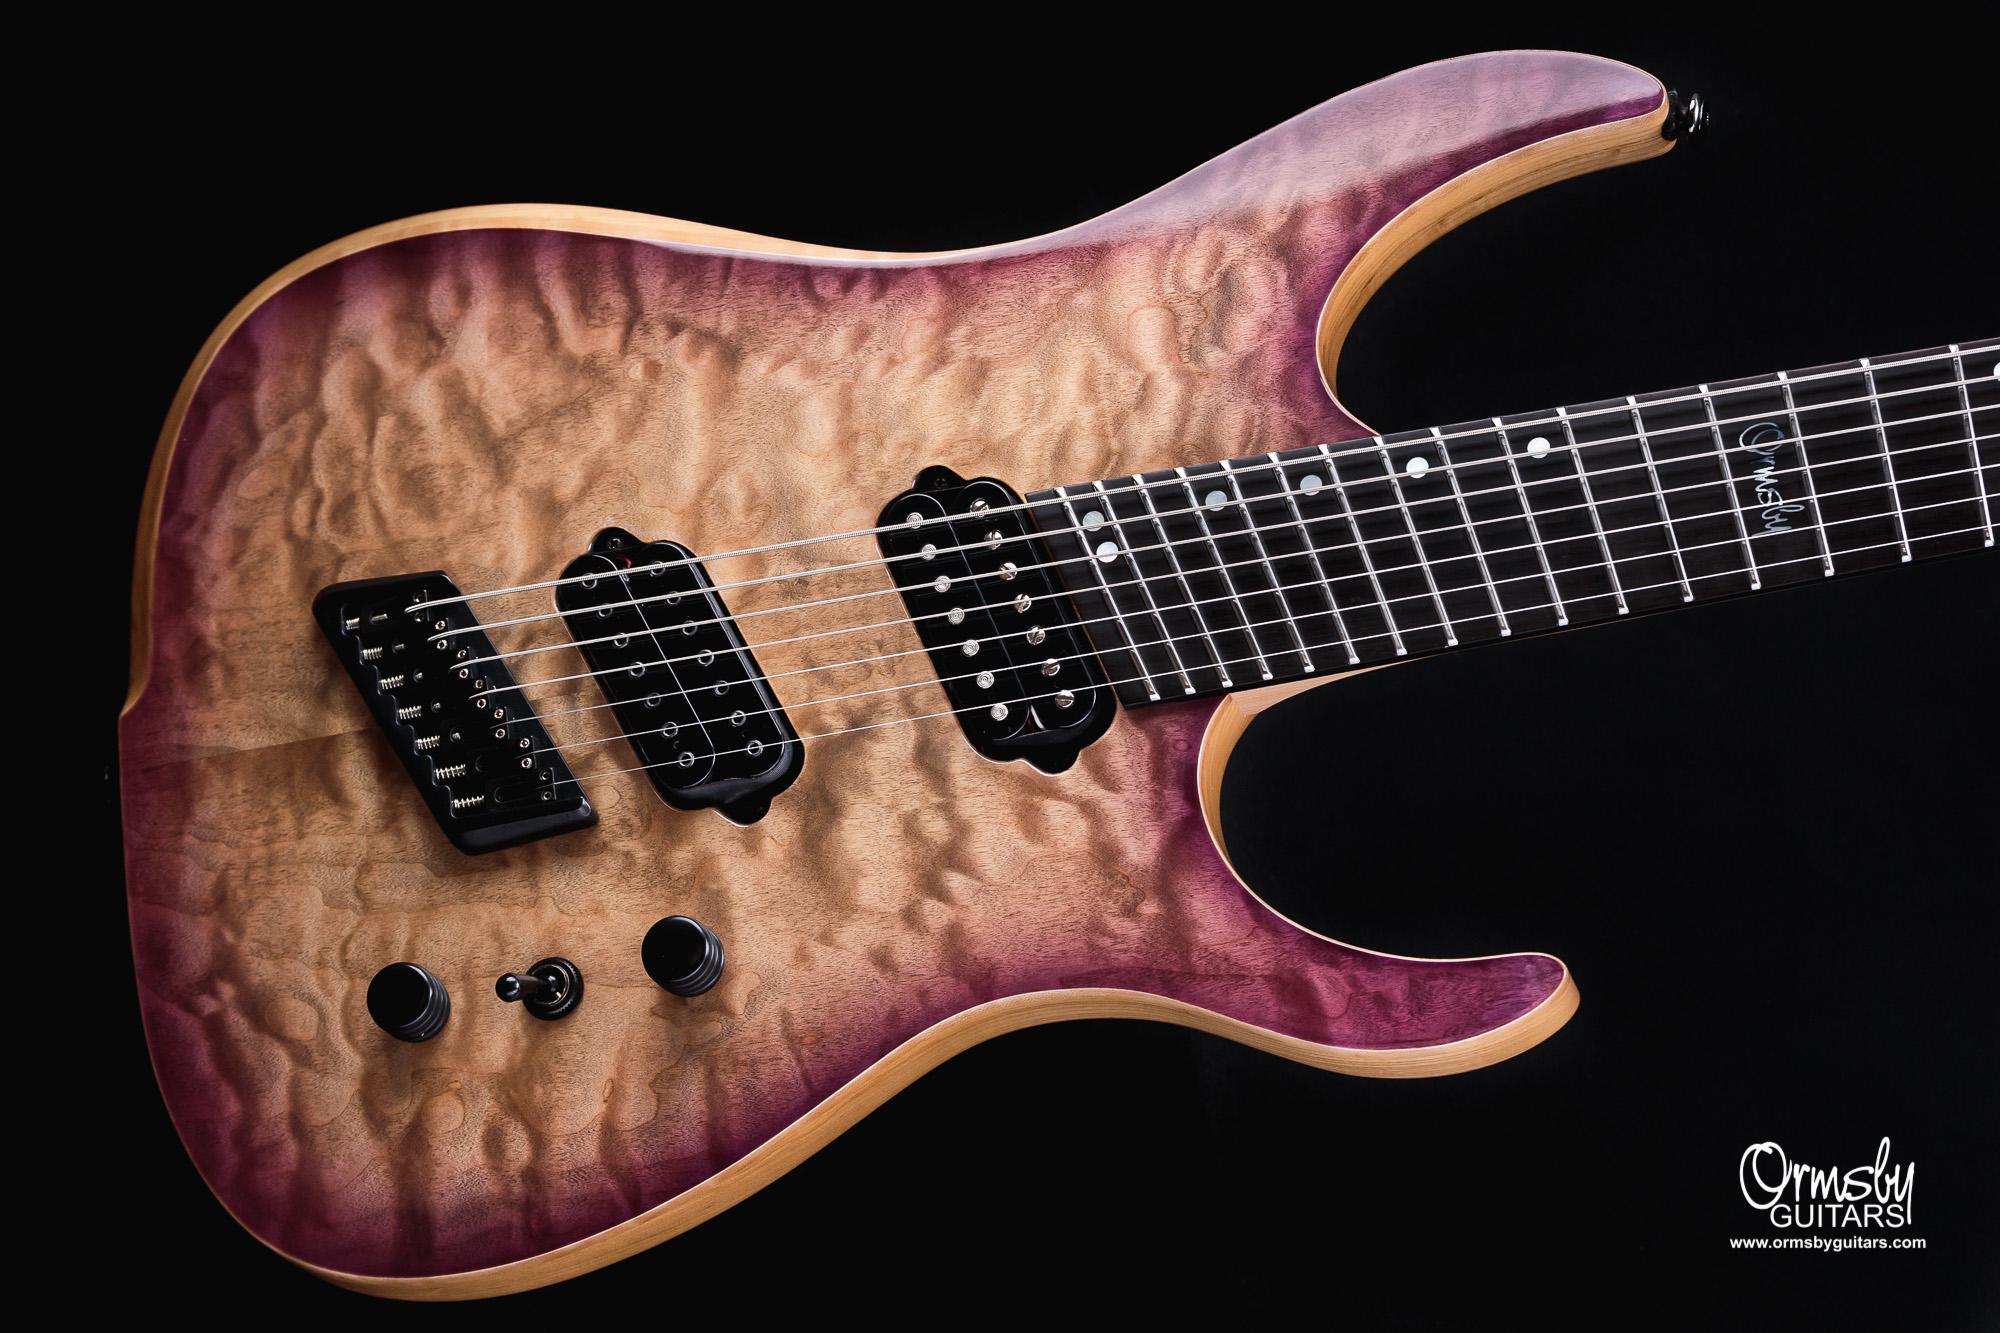 Ormsby Guitars Custom Factory